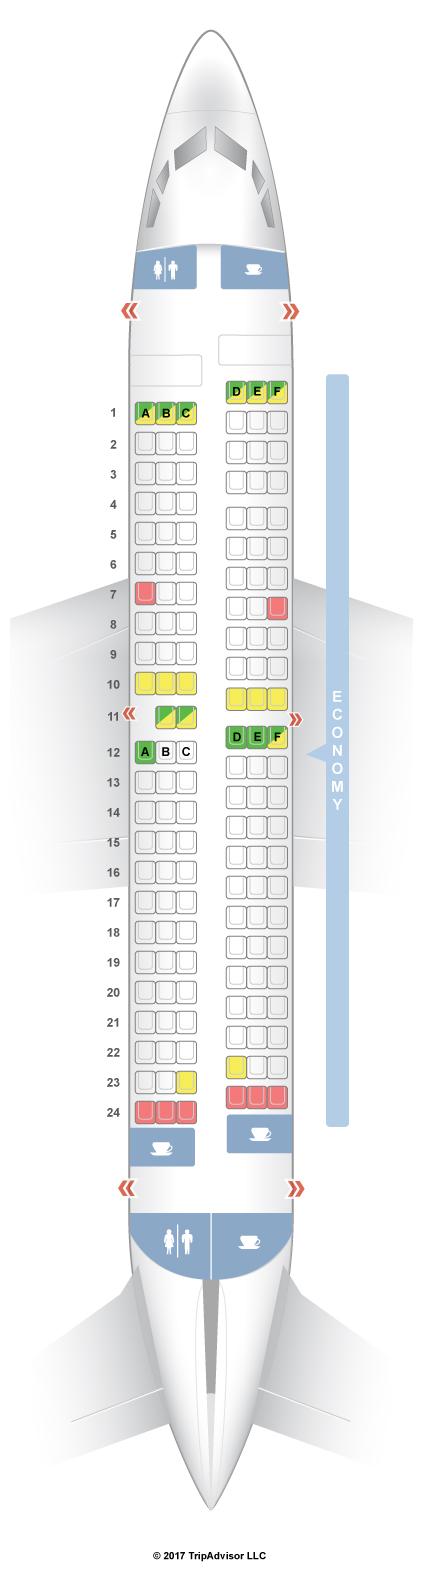 Seatguru seat map southwest boeing 737 700 737